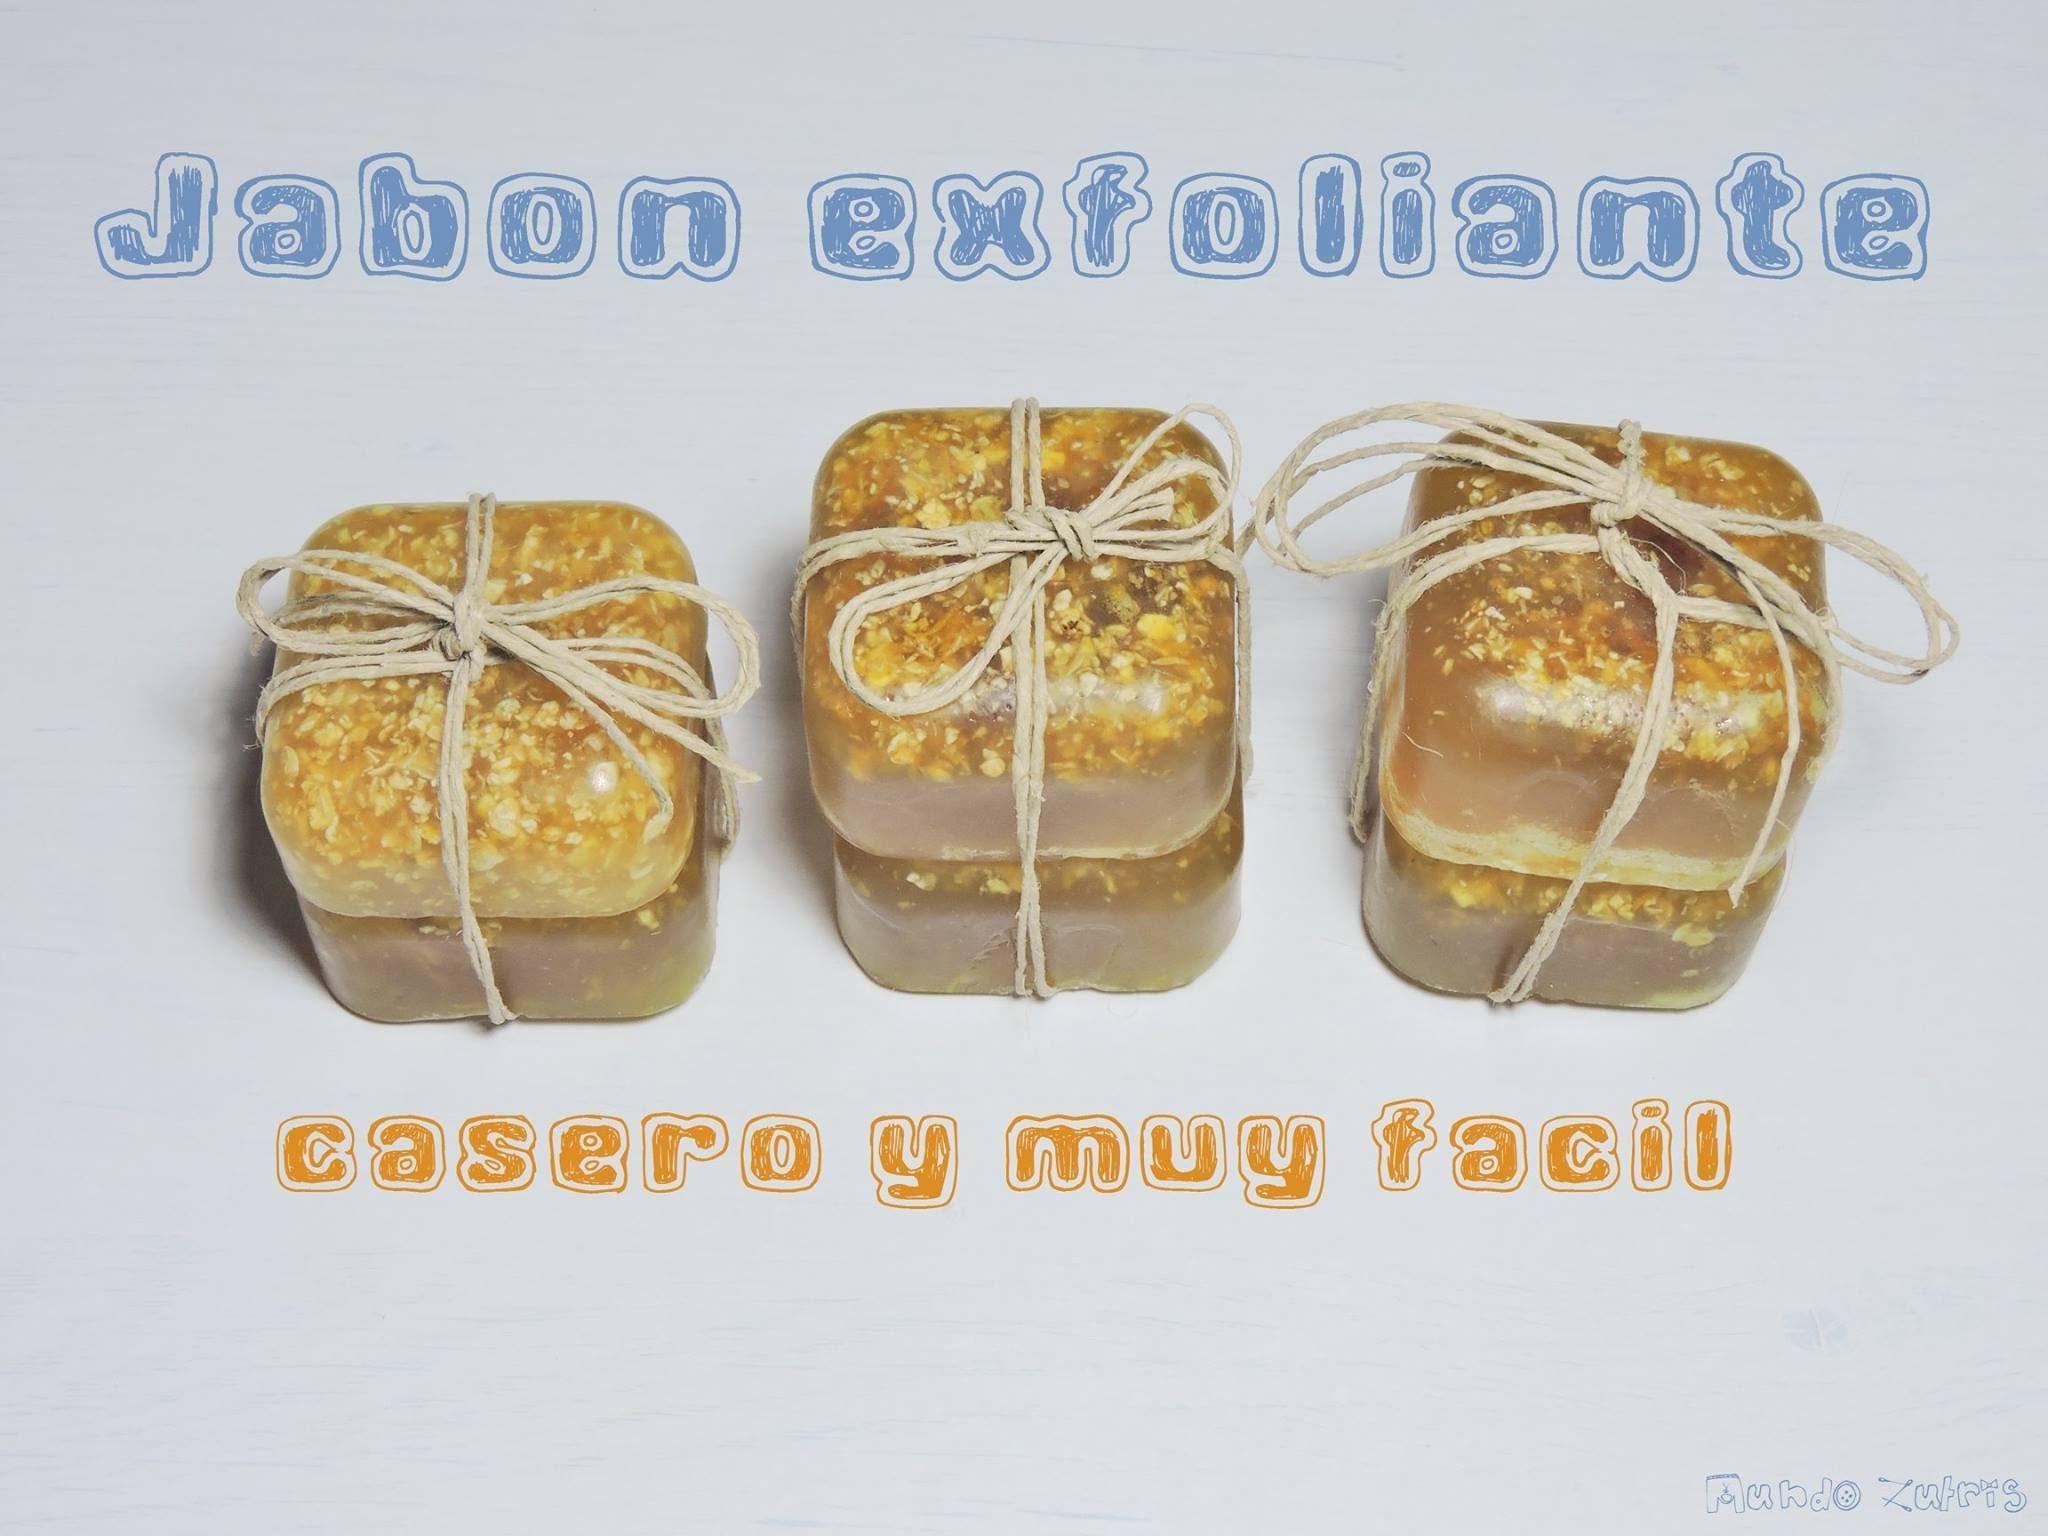 Jabón exfoliante casero - Handmade exfoliating soap